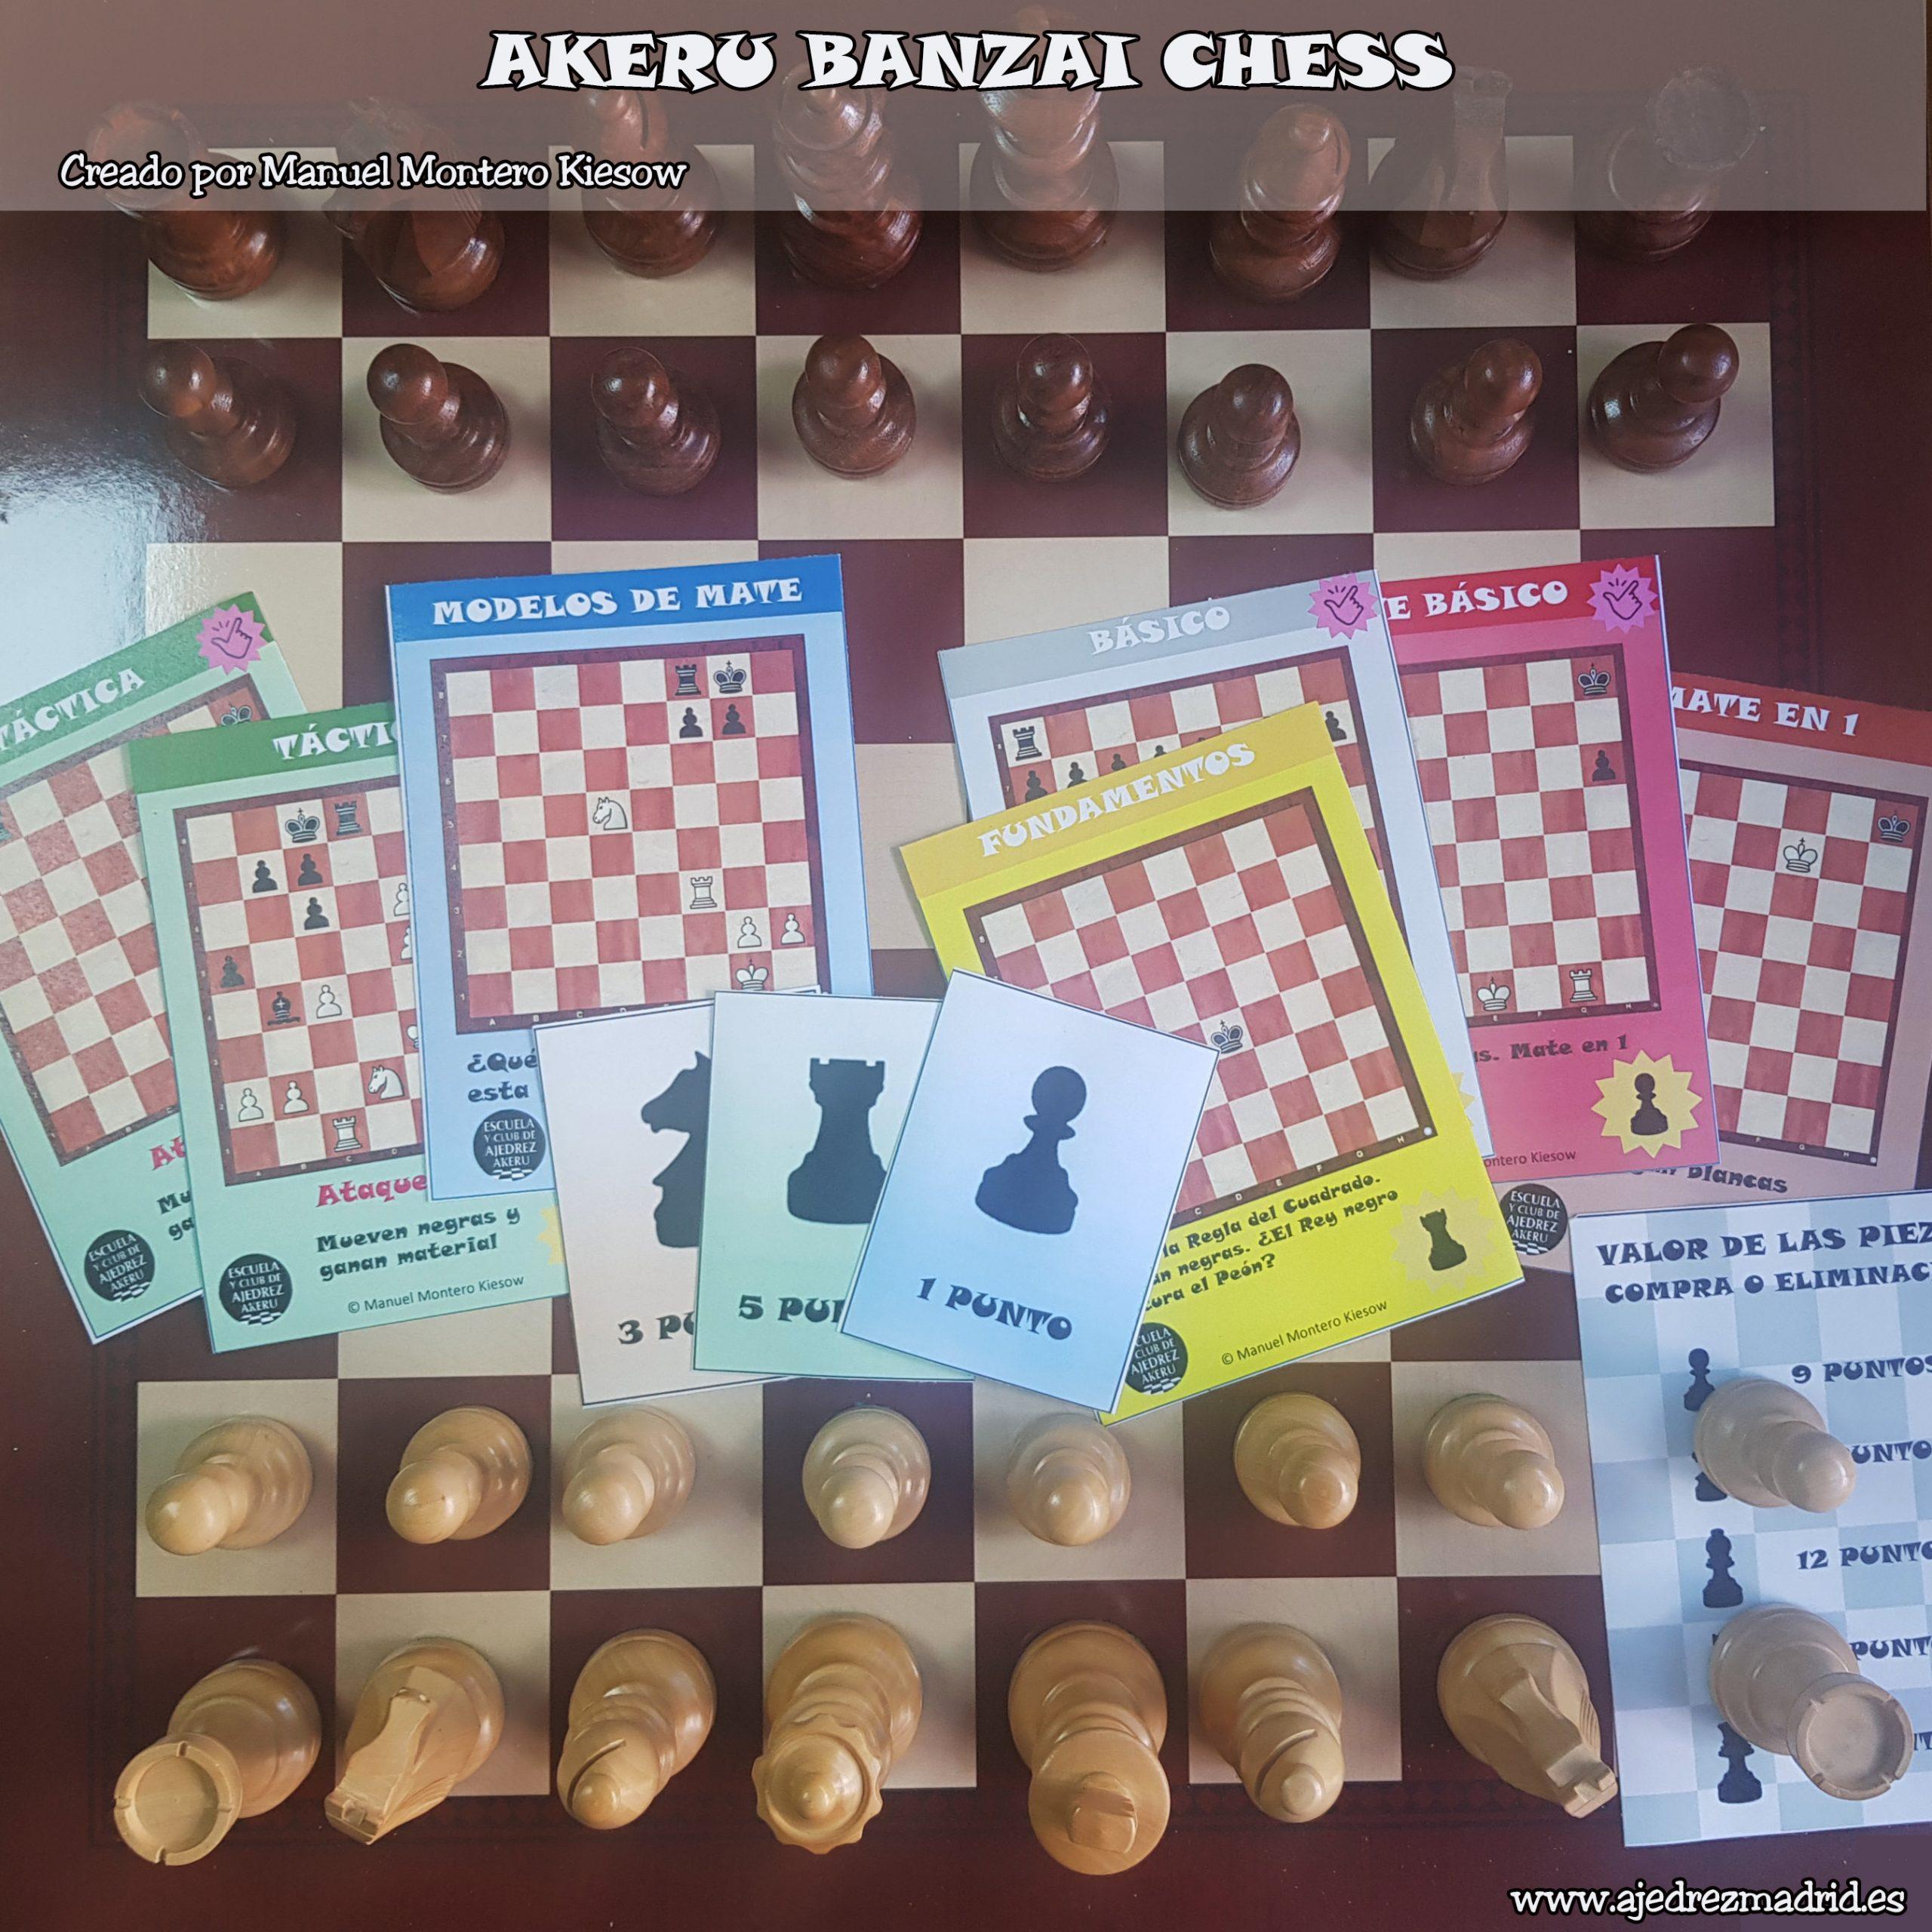 AKERU BANZAI CHESS